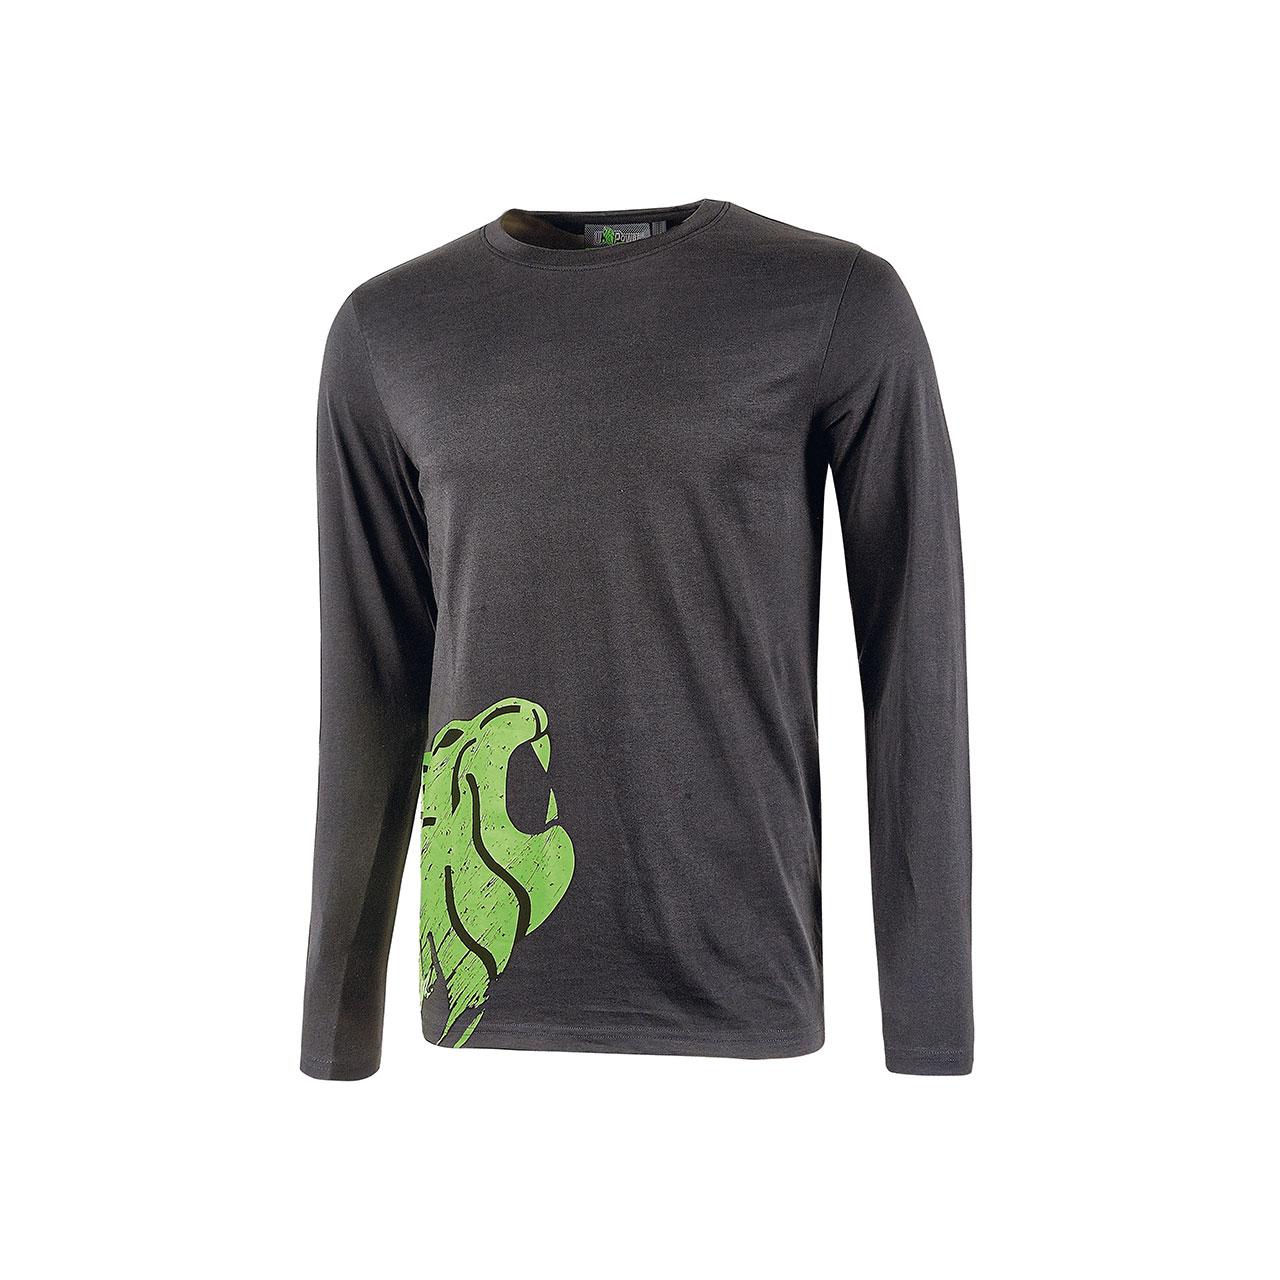 tshirt da lavoro upower modello alien colore asphalt grey